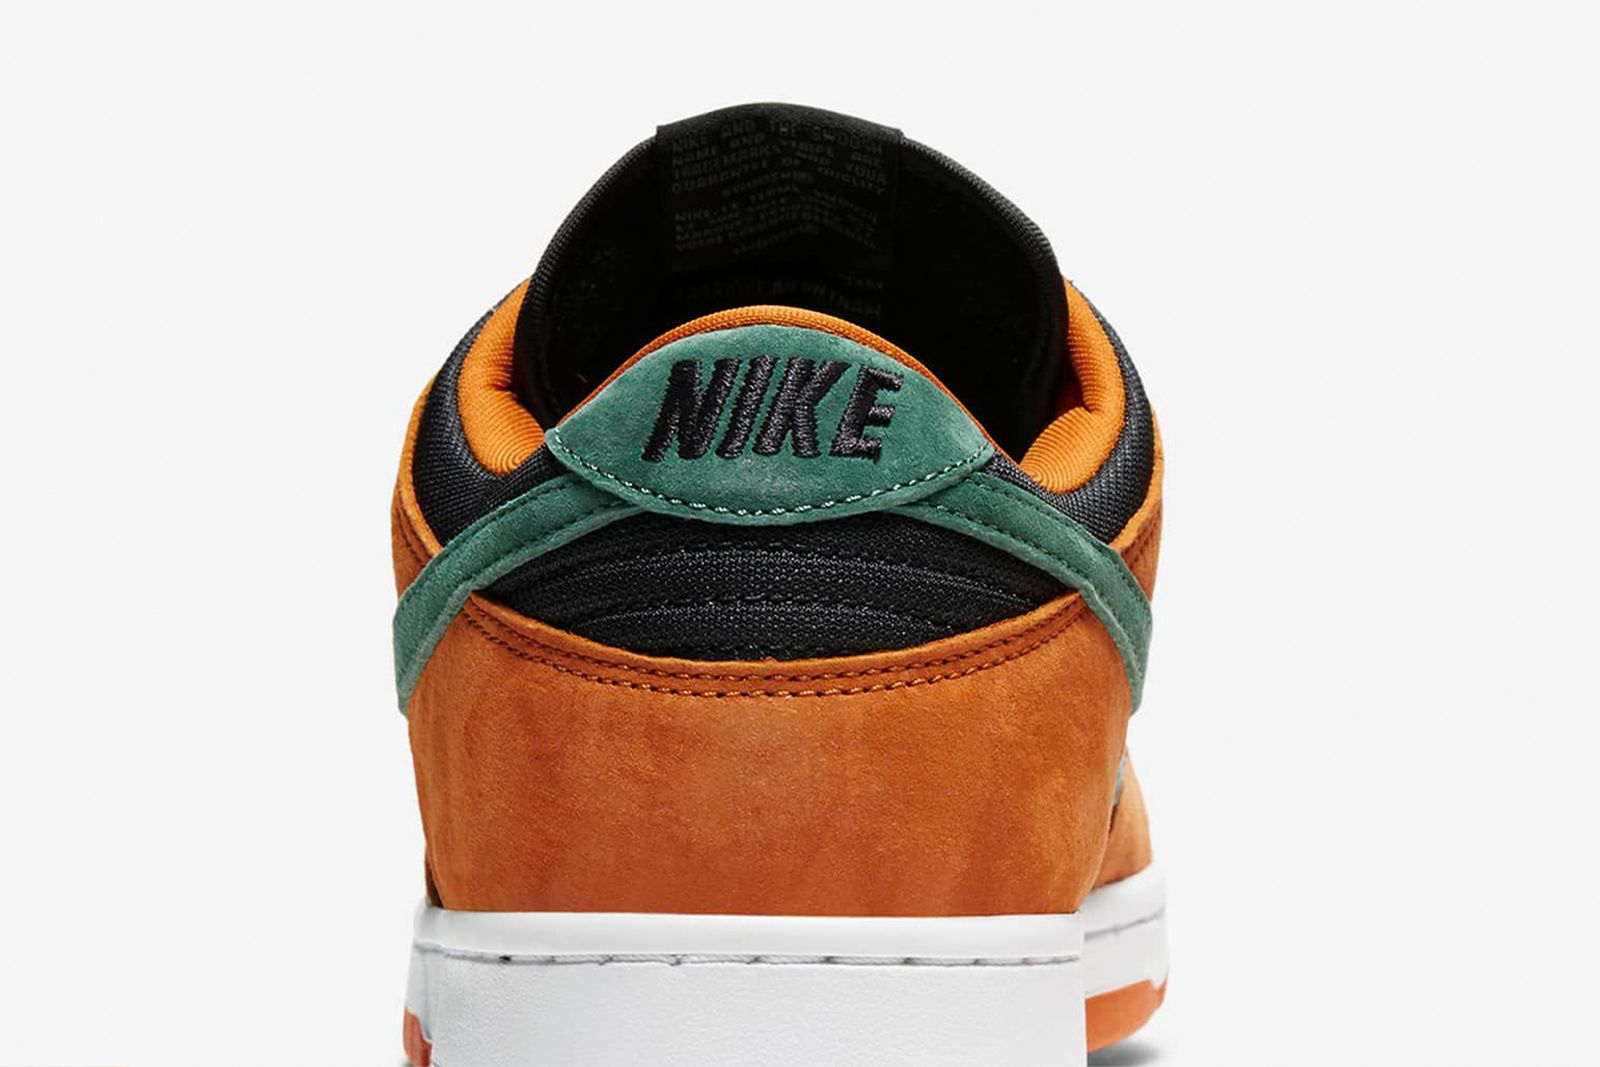 nike-dunk-low-ceramic-release-date-price-07